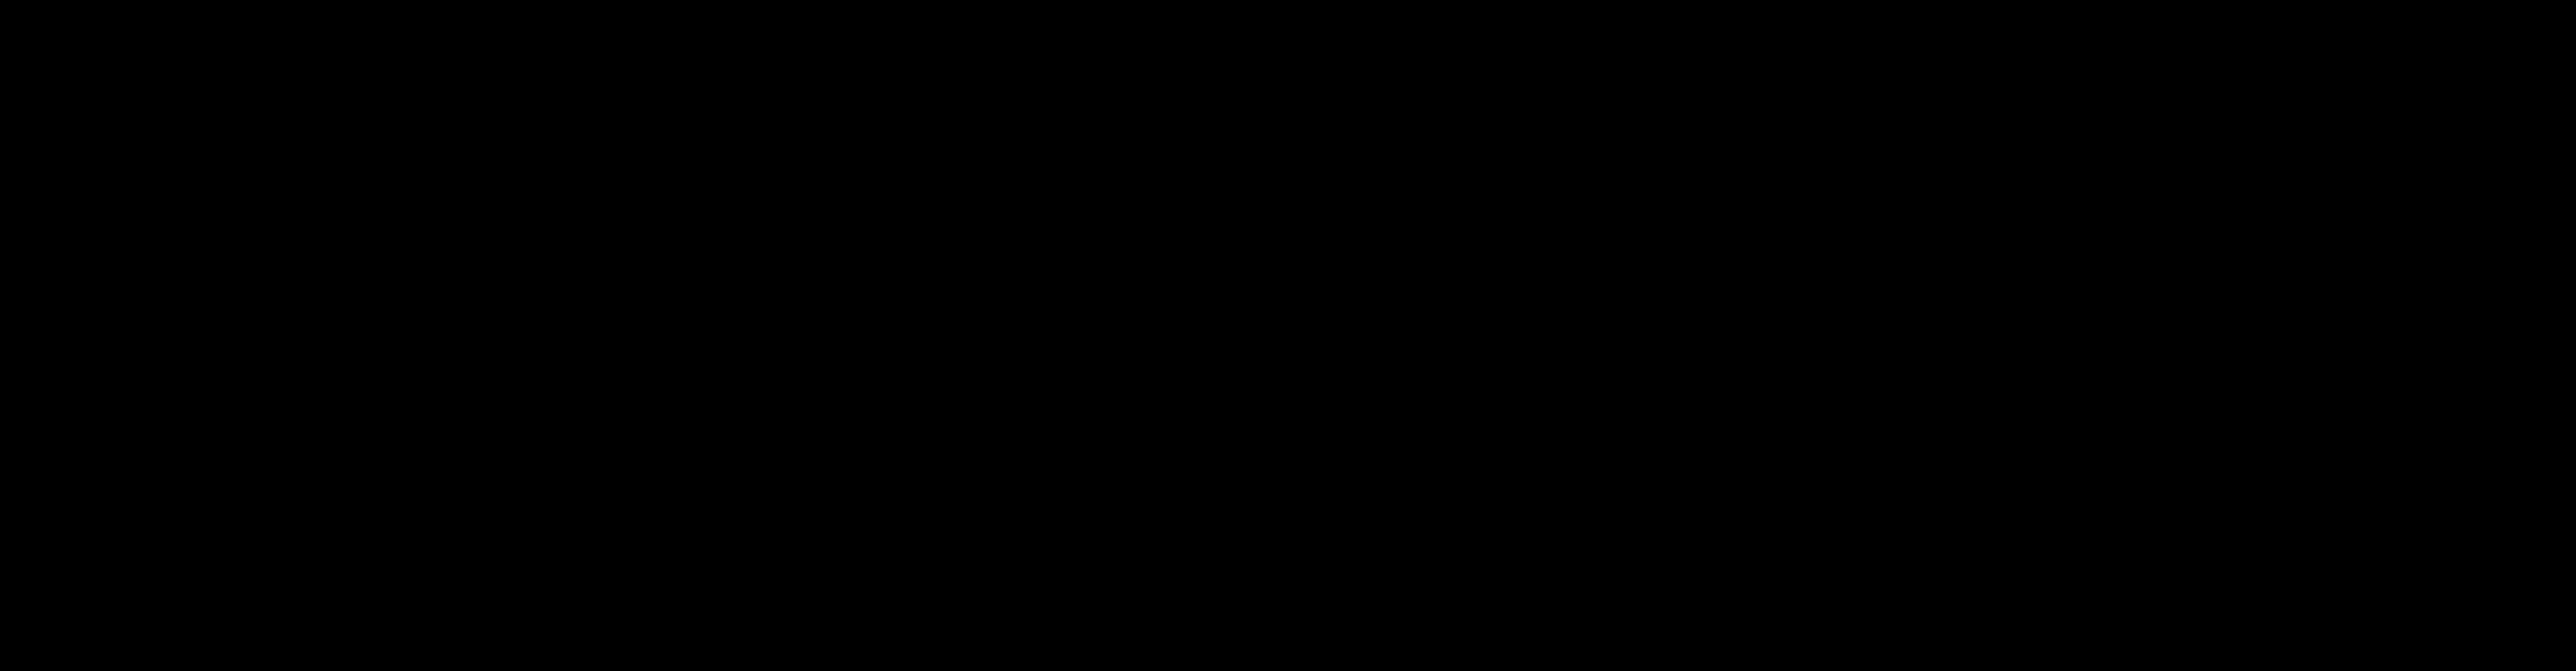 Cosmopolitan_logo_black